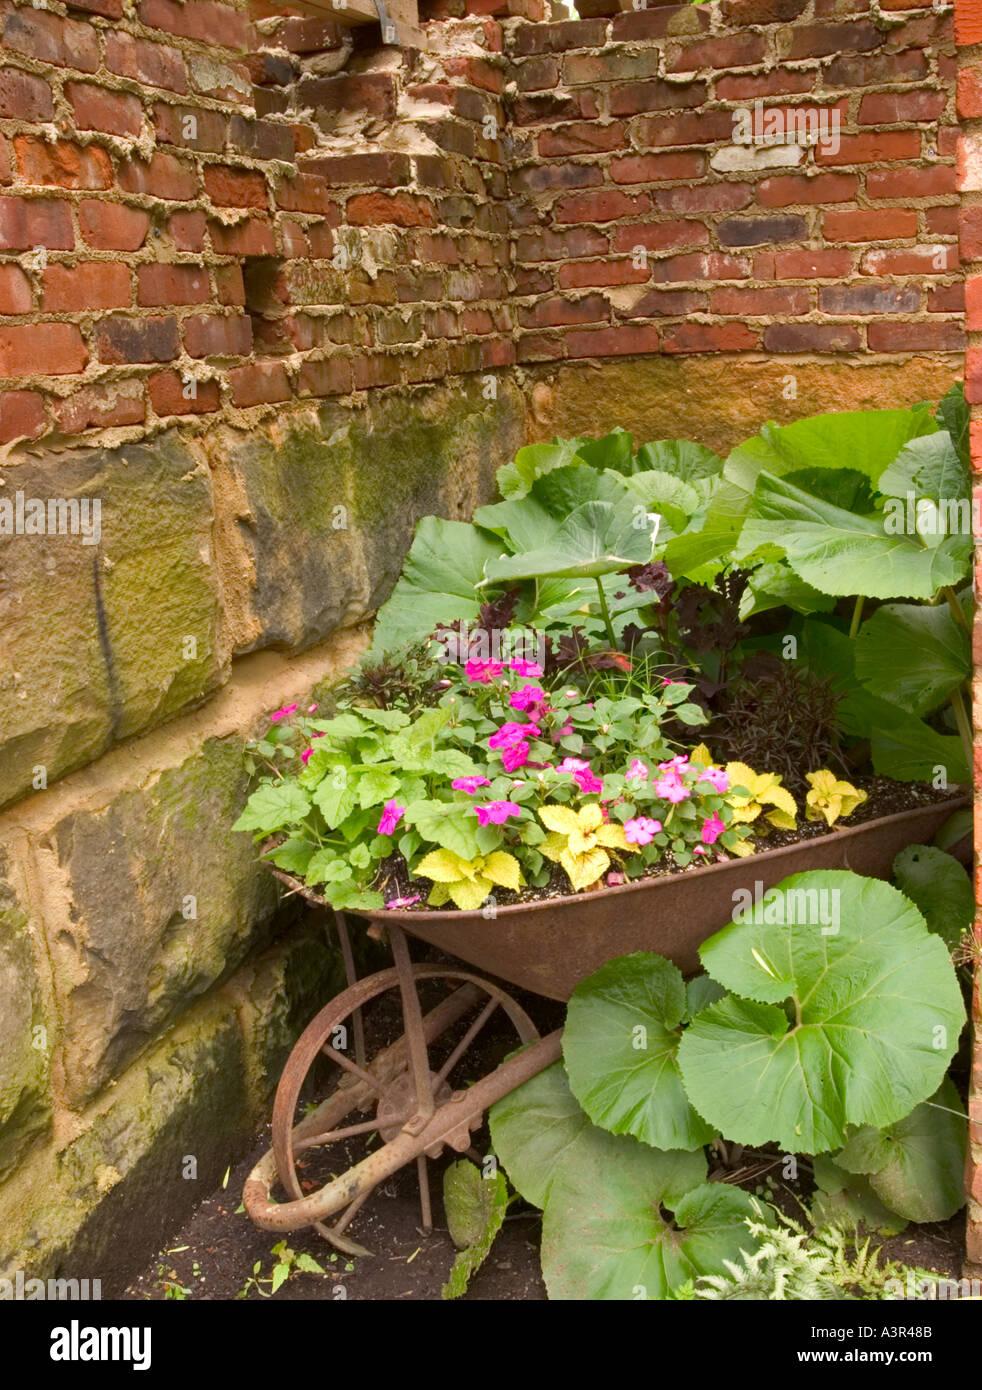 Inniswood Gardens Stock Photos & Inniswood Gardens Stock Images - Alamy